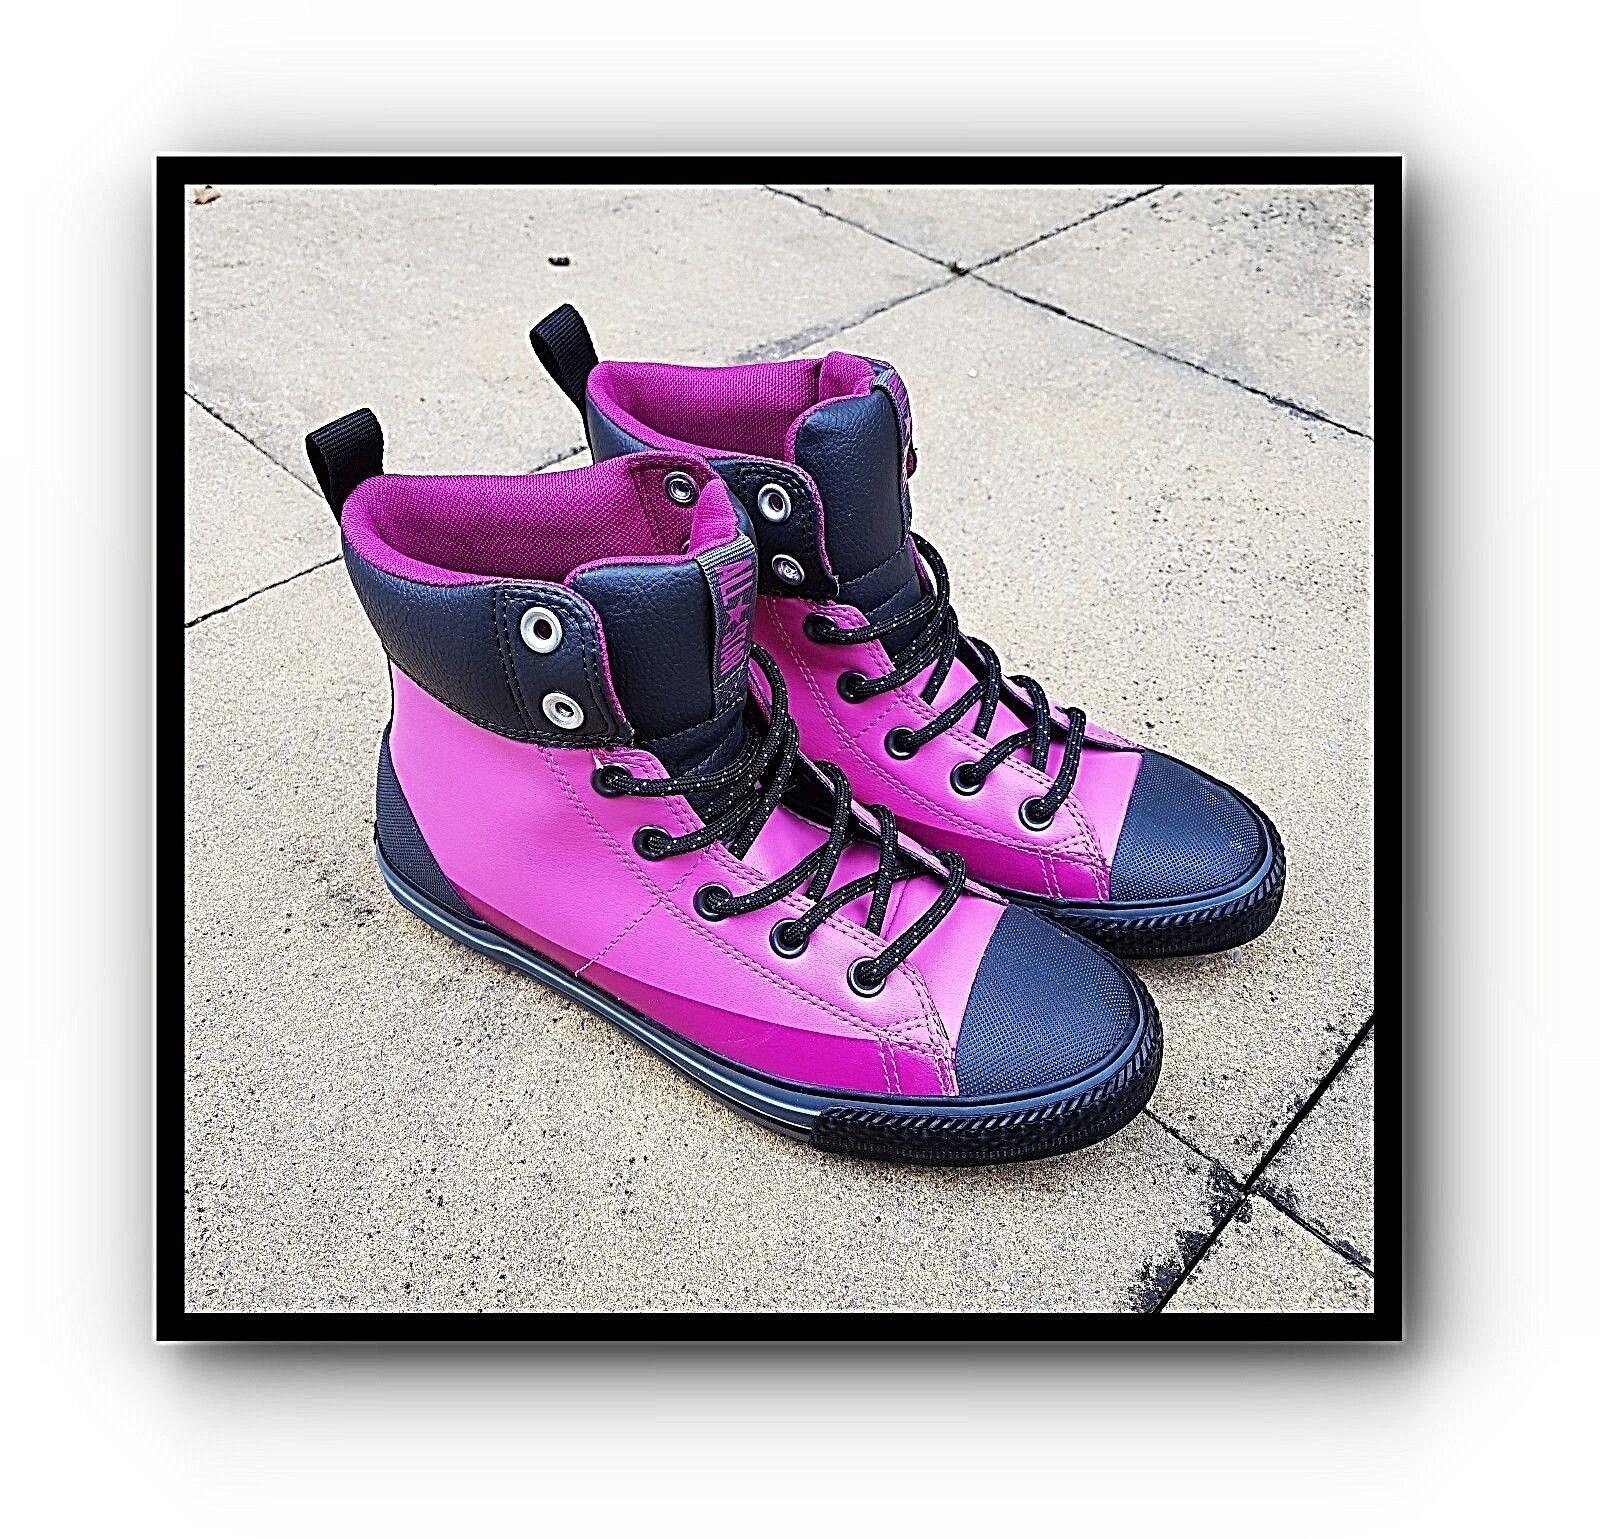 CONVERSE ALL STAR PINK BLACK VEGAN 80S HI-TOP TRAINERS RARE Schuhe HIPSTER 5 NEU❤